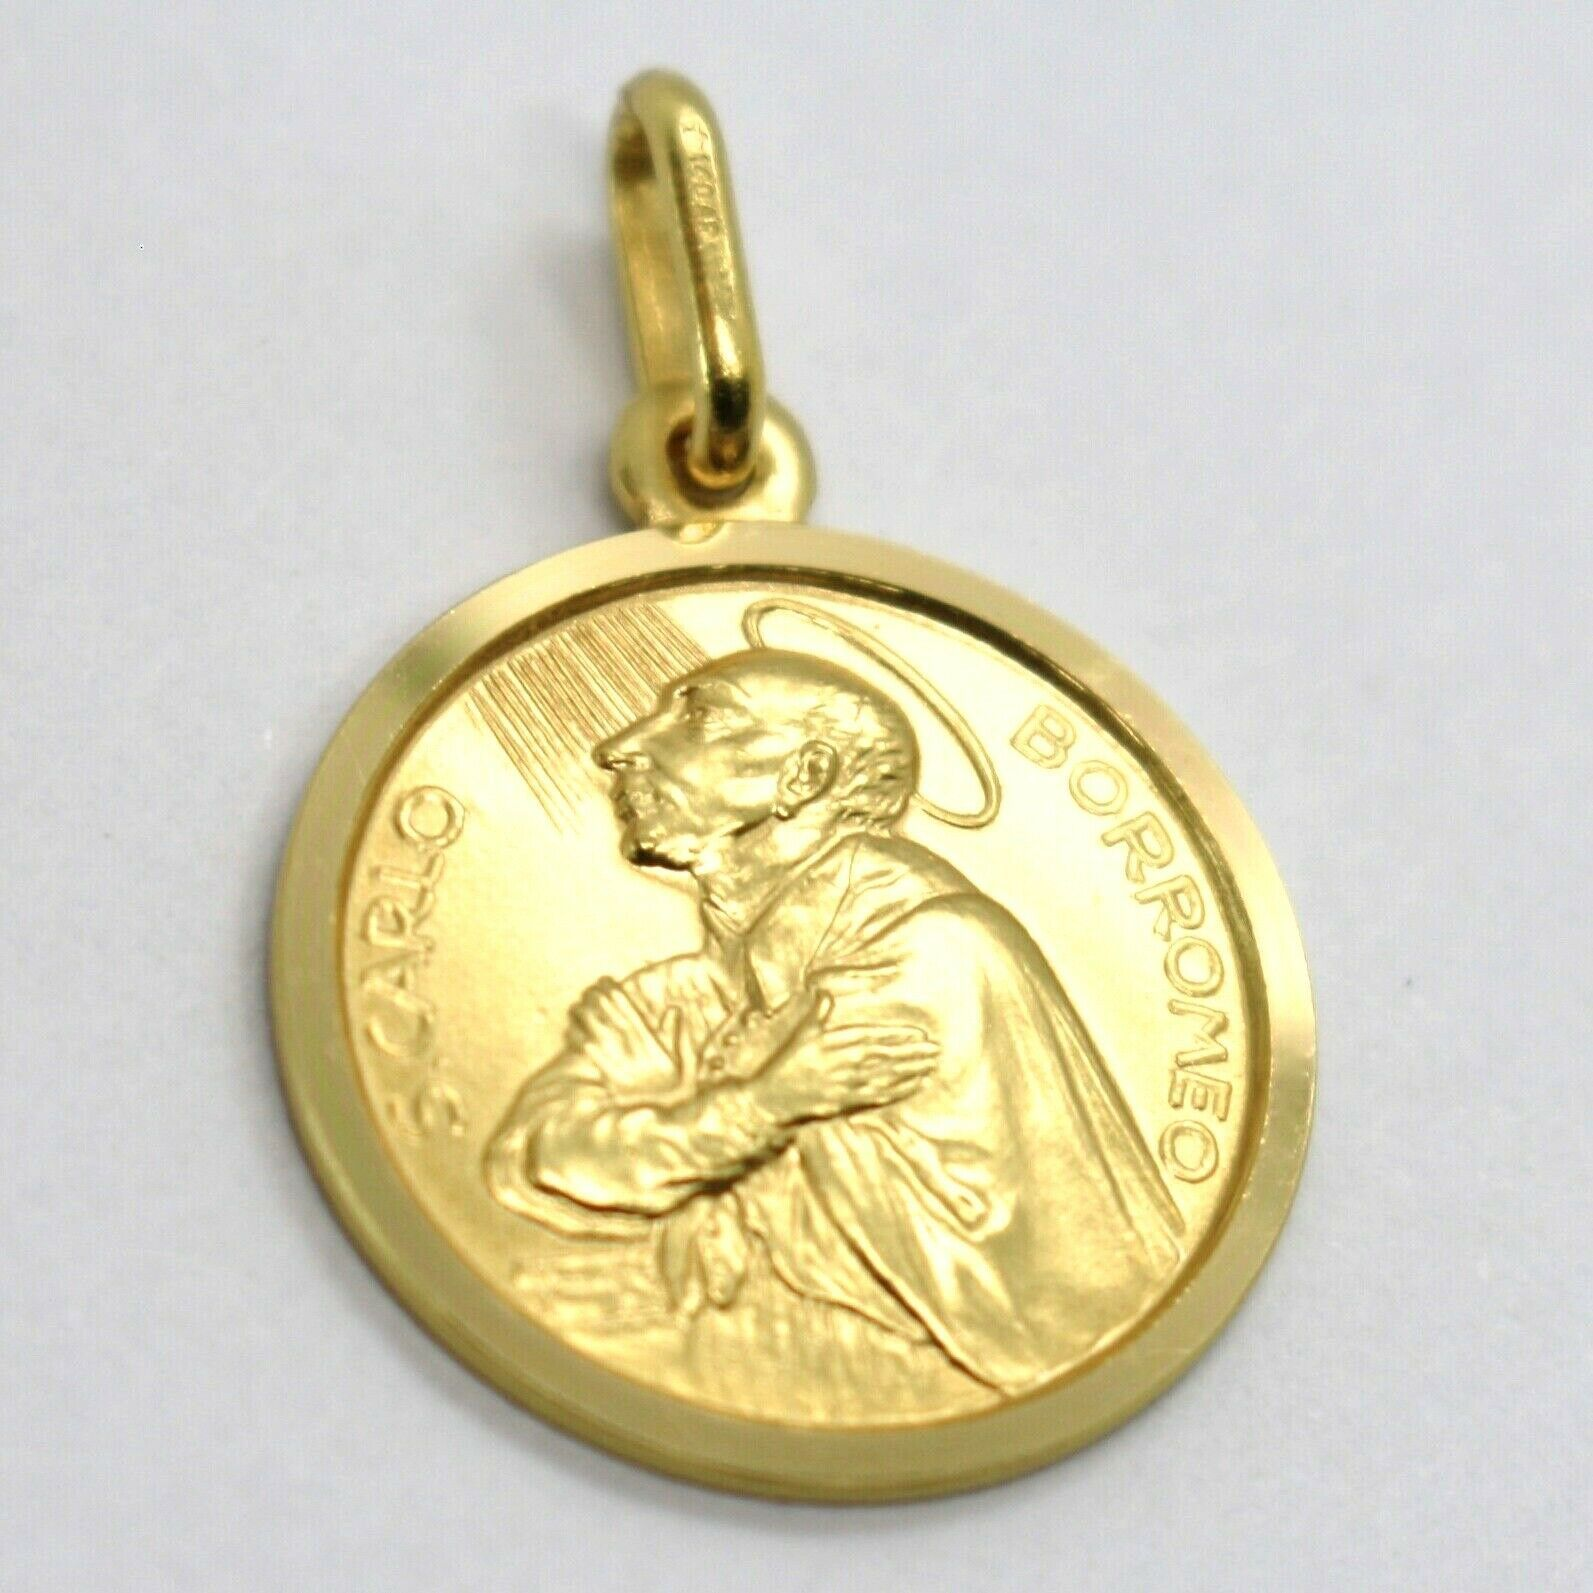 SOLID 18K YELLOW GOLD MEDAL, SAINT CARLO CHARLES BORROMEO, 17 mm DIAMETER image 2